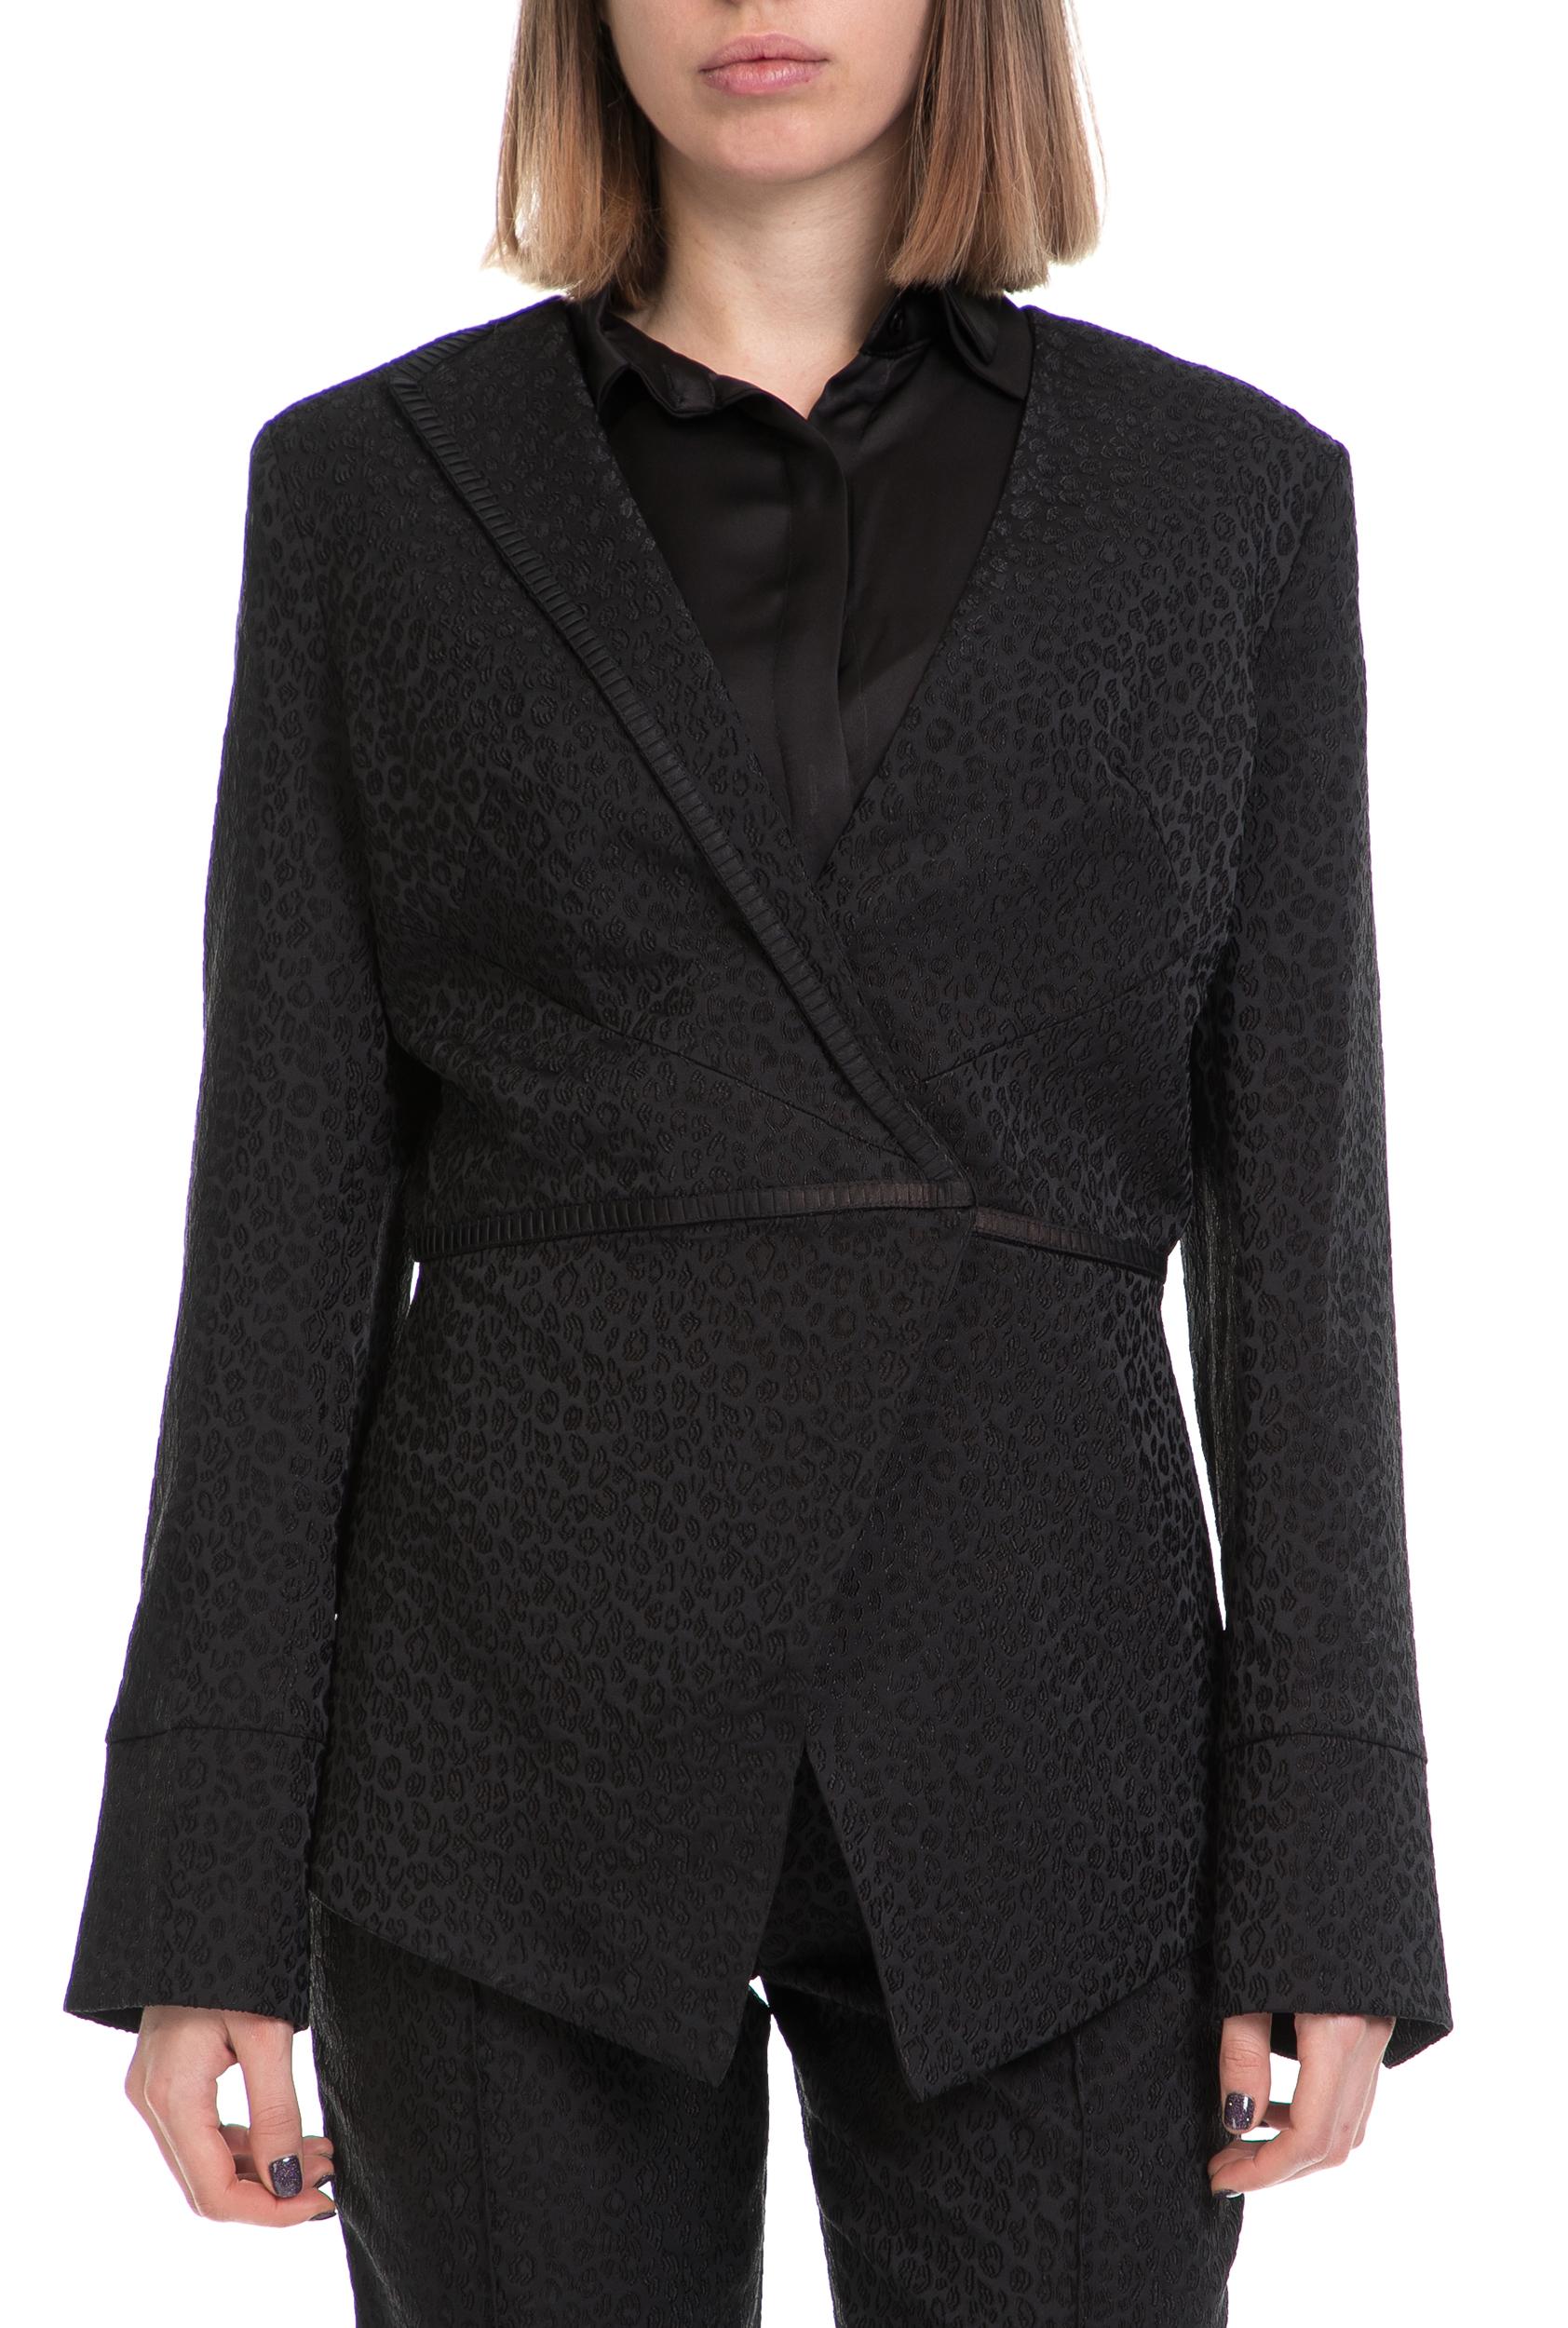 YVONNE BOSNJAK - Γυναικείο σακάκι YVONNE BOSNJAK μαύρο γυναικεία ρούχα πανωφόρια σακάκια